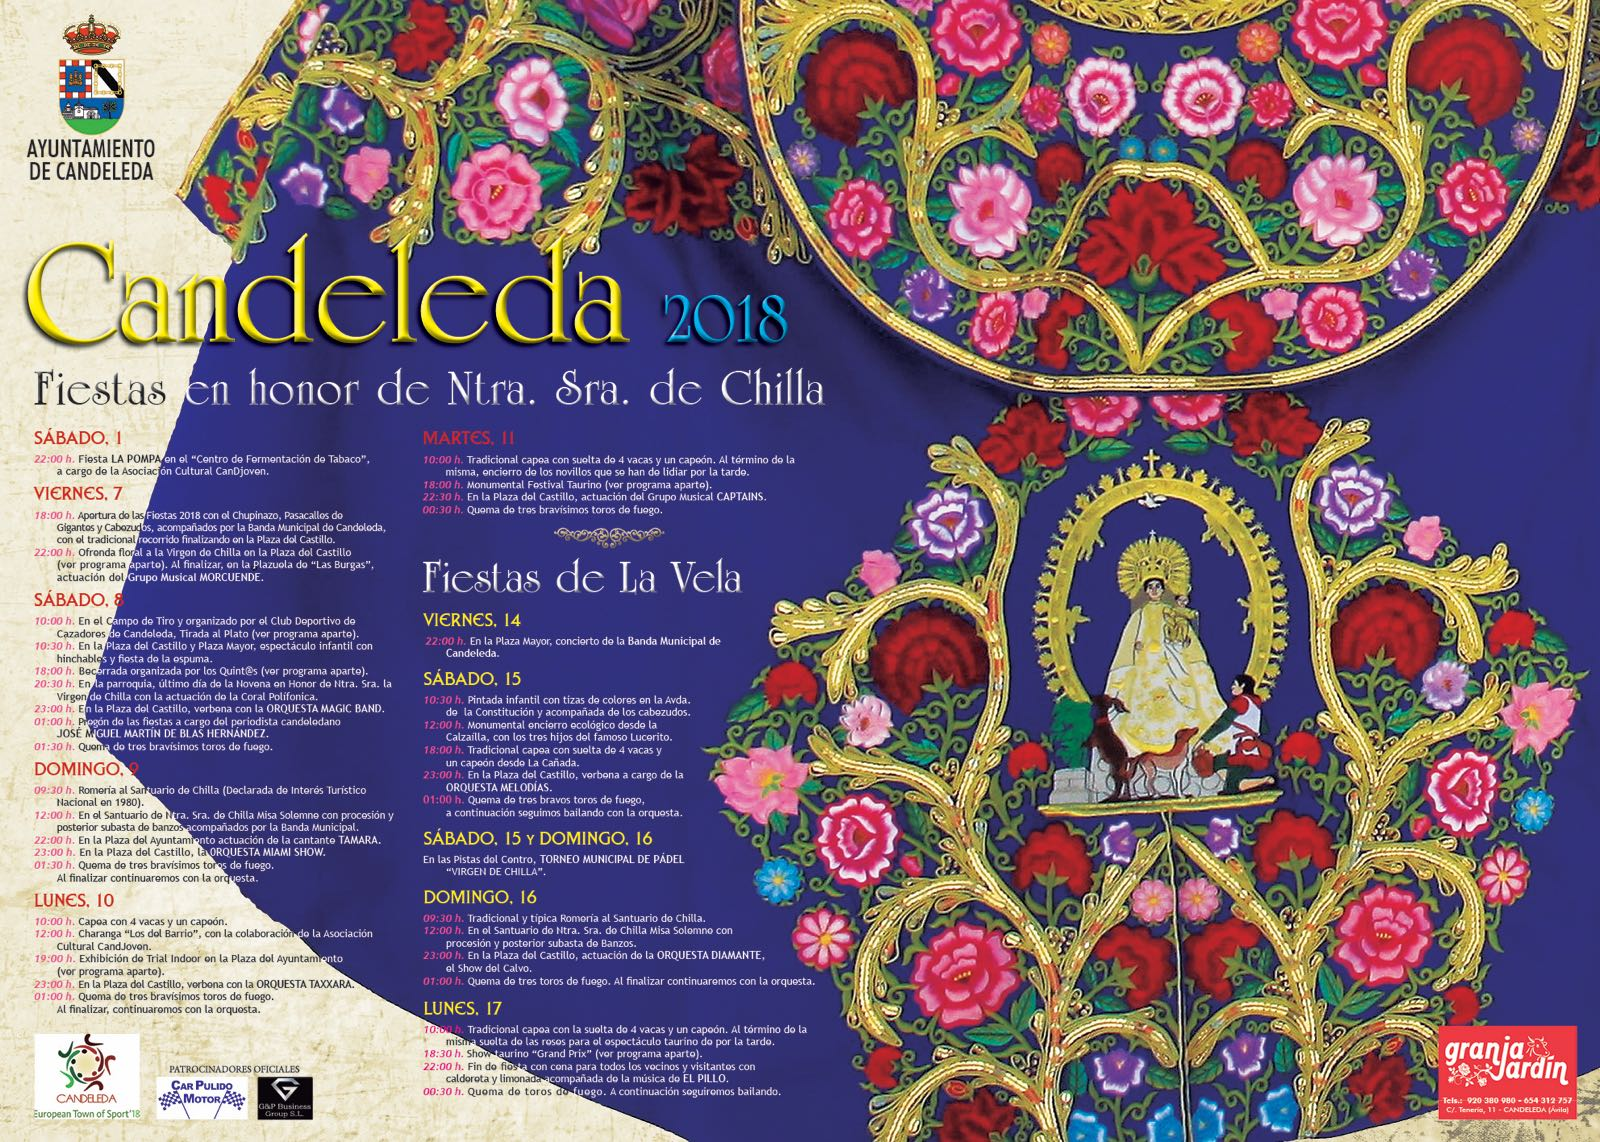 Fiestas de la Virgen de Chilla - Candeleda - TiétarTeVe